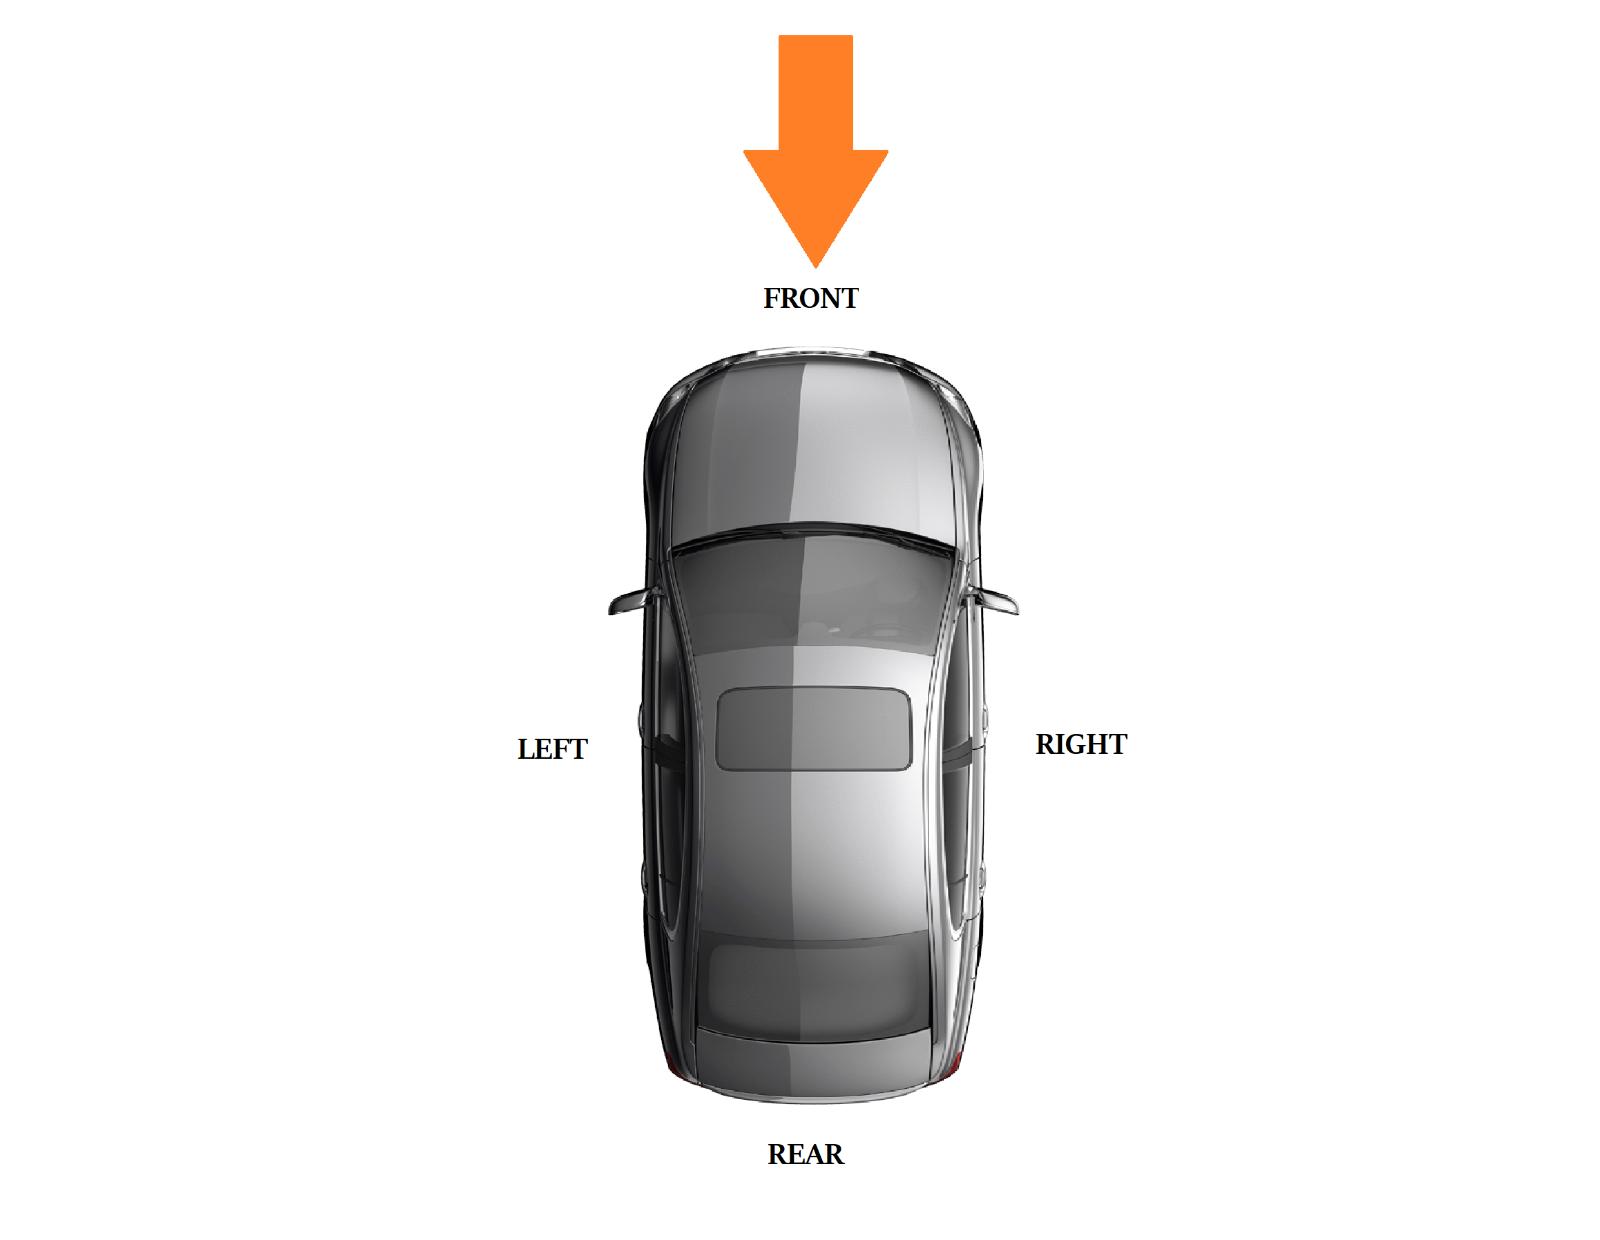 NUOVO Originale Mercedes MB CLK W209 AVANTGARDE Paraurti Anteriore Chrome Trim Sinistro N//S